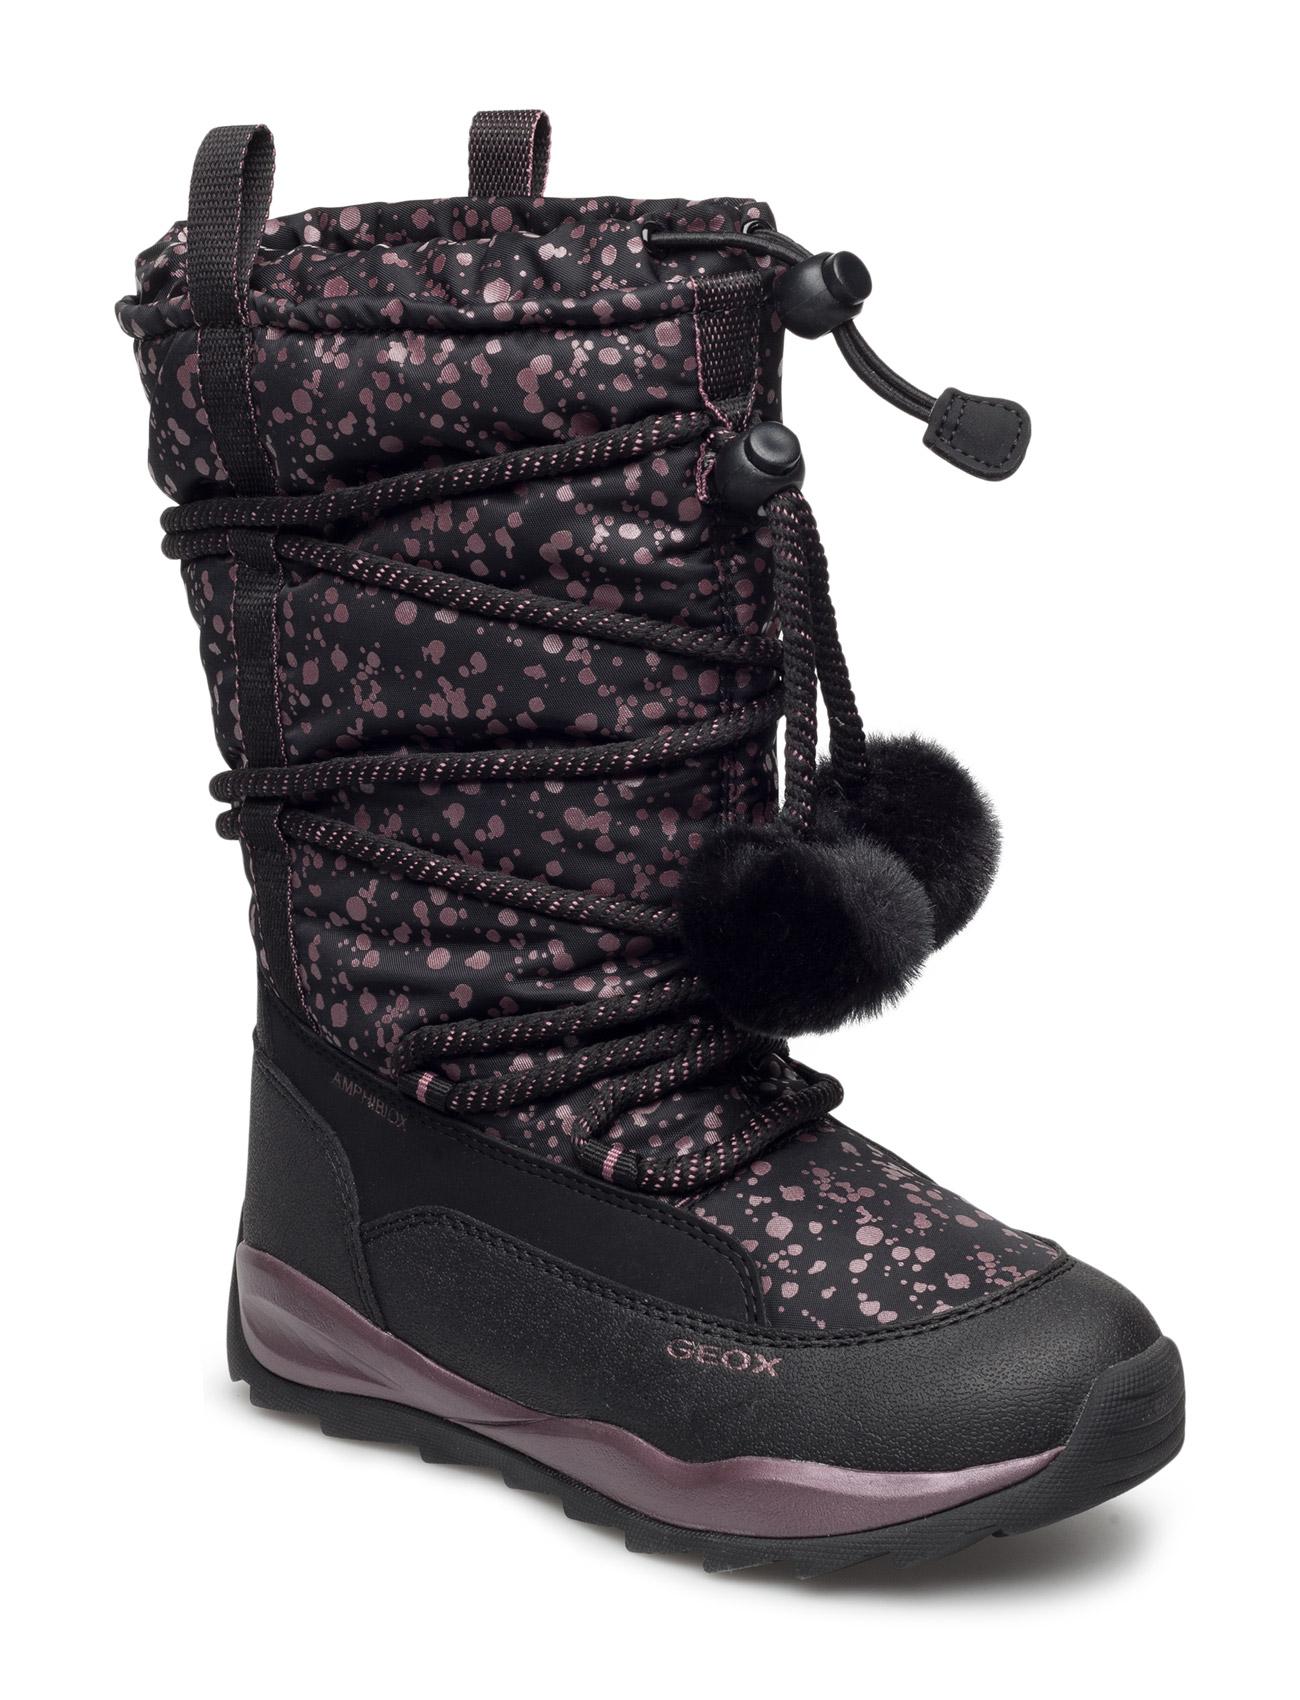 J Orizont B Girl Abx GEOX Støvler til Børn i Black Oxford